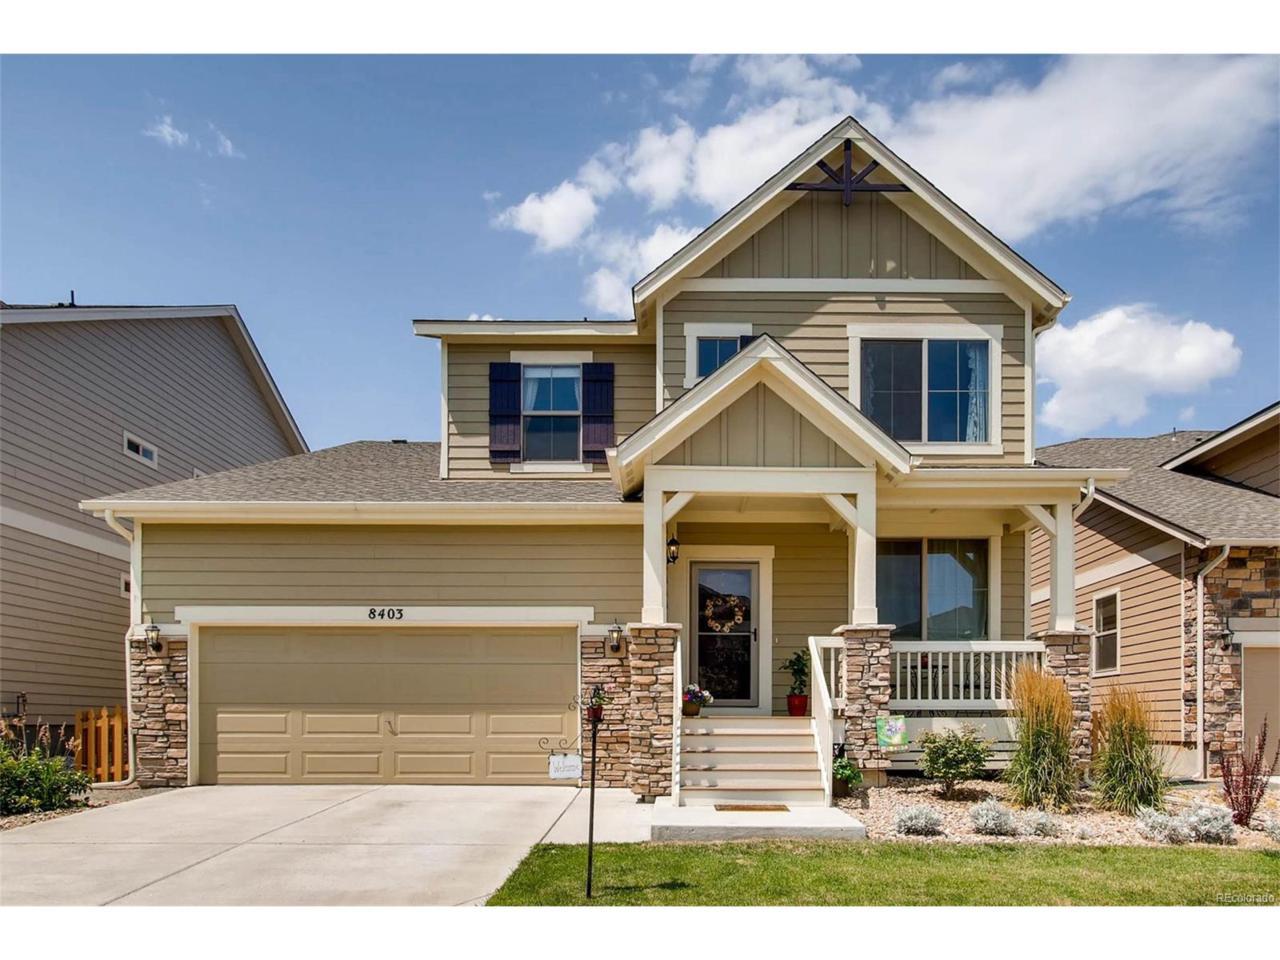 8403 Gladiola Street, Arvada, CO 80005 (MLS #1713438) :: 8z Real Estate